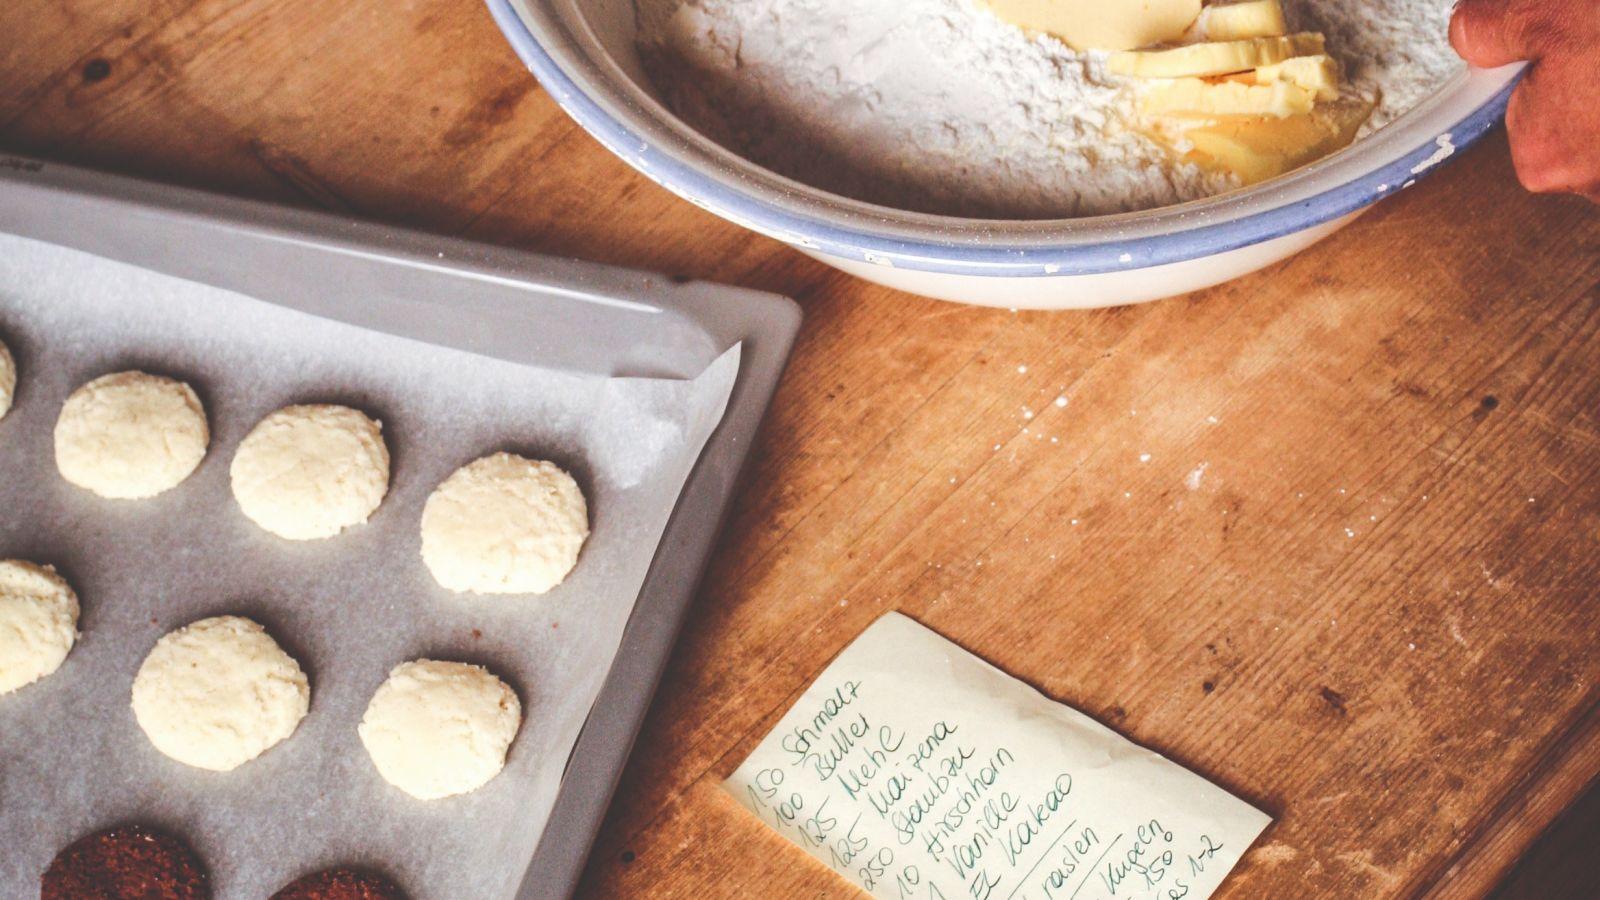 Wild boar lard nuts for Christmas baking tray, recipe